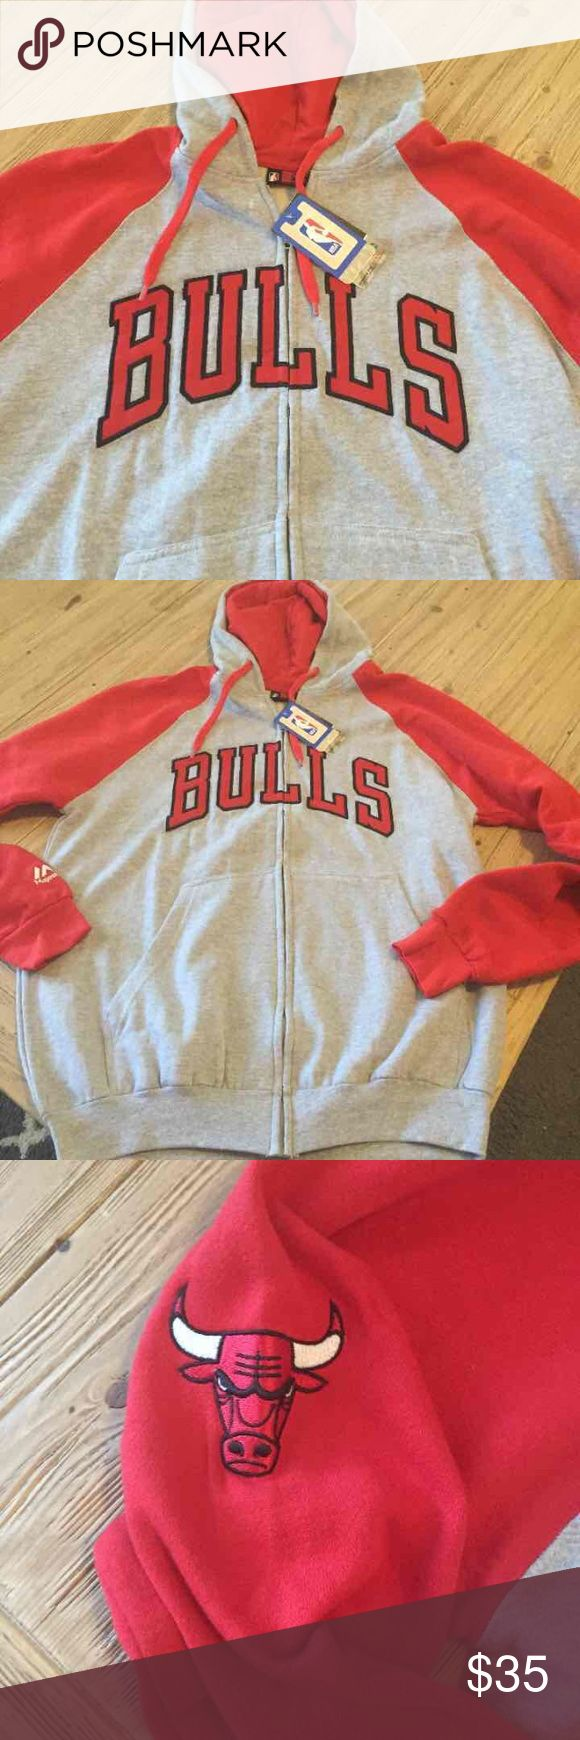 Mens LT Chicago Bulls zip up hoodie $55 Mens large tall Chicago Bulls hooded sweatshirt.  Retail $55 Shirts Sweatshirts & Hoodies